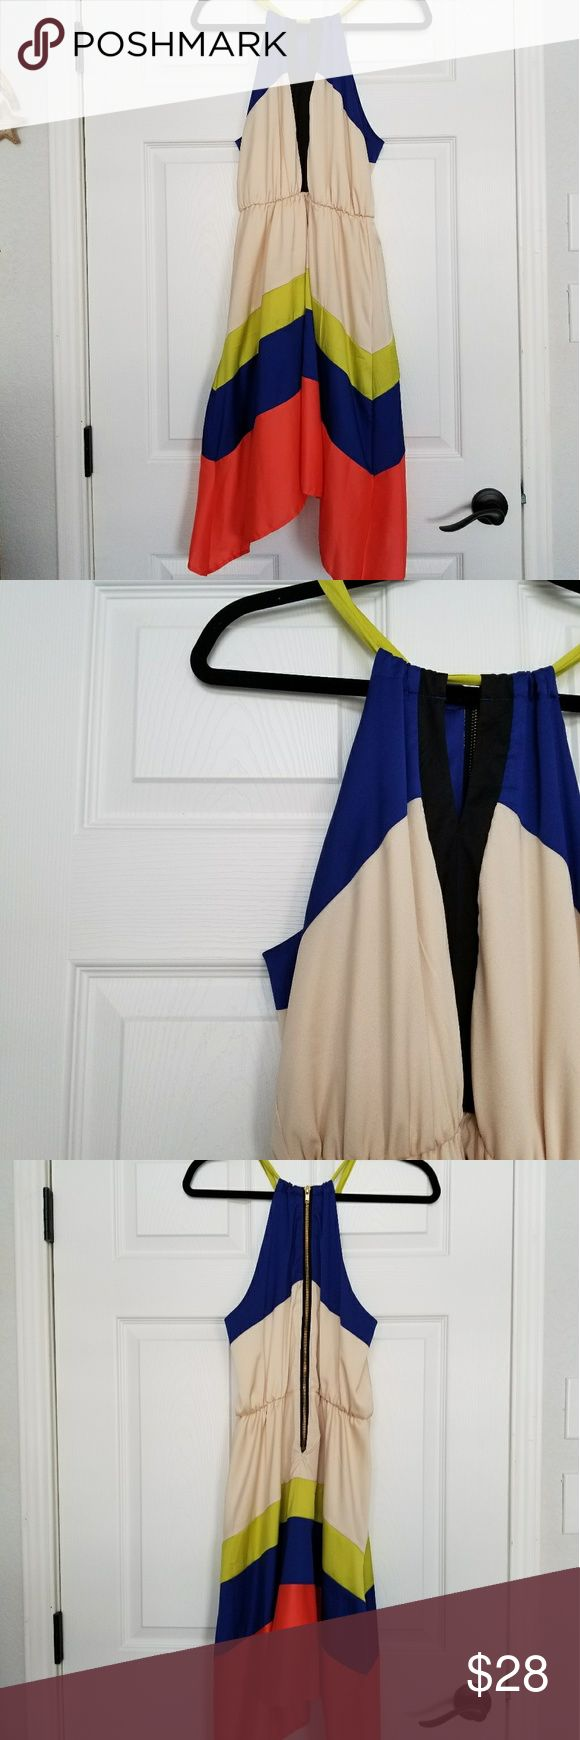 Gianni Bini colorblock flowy halter dress sz. 9 Gianni Bini colorblock flowy halter dress sz. 9 .  Excellent condition. Great dress for Spring! Gianni Bini Dresses Midi